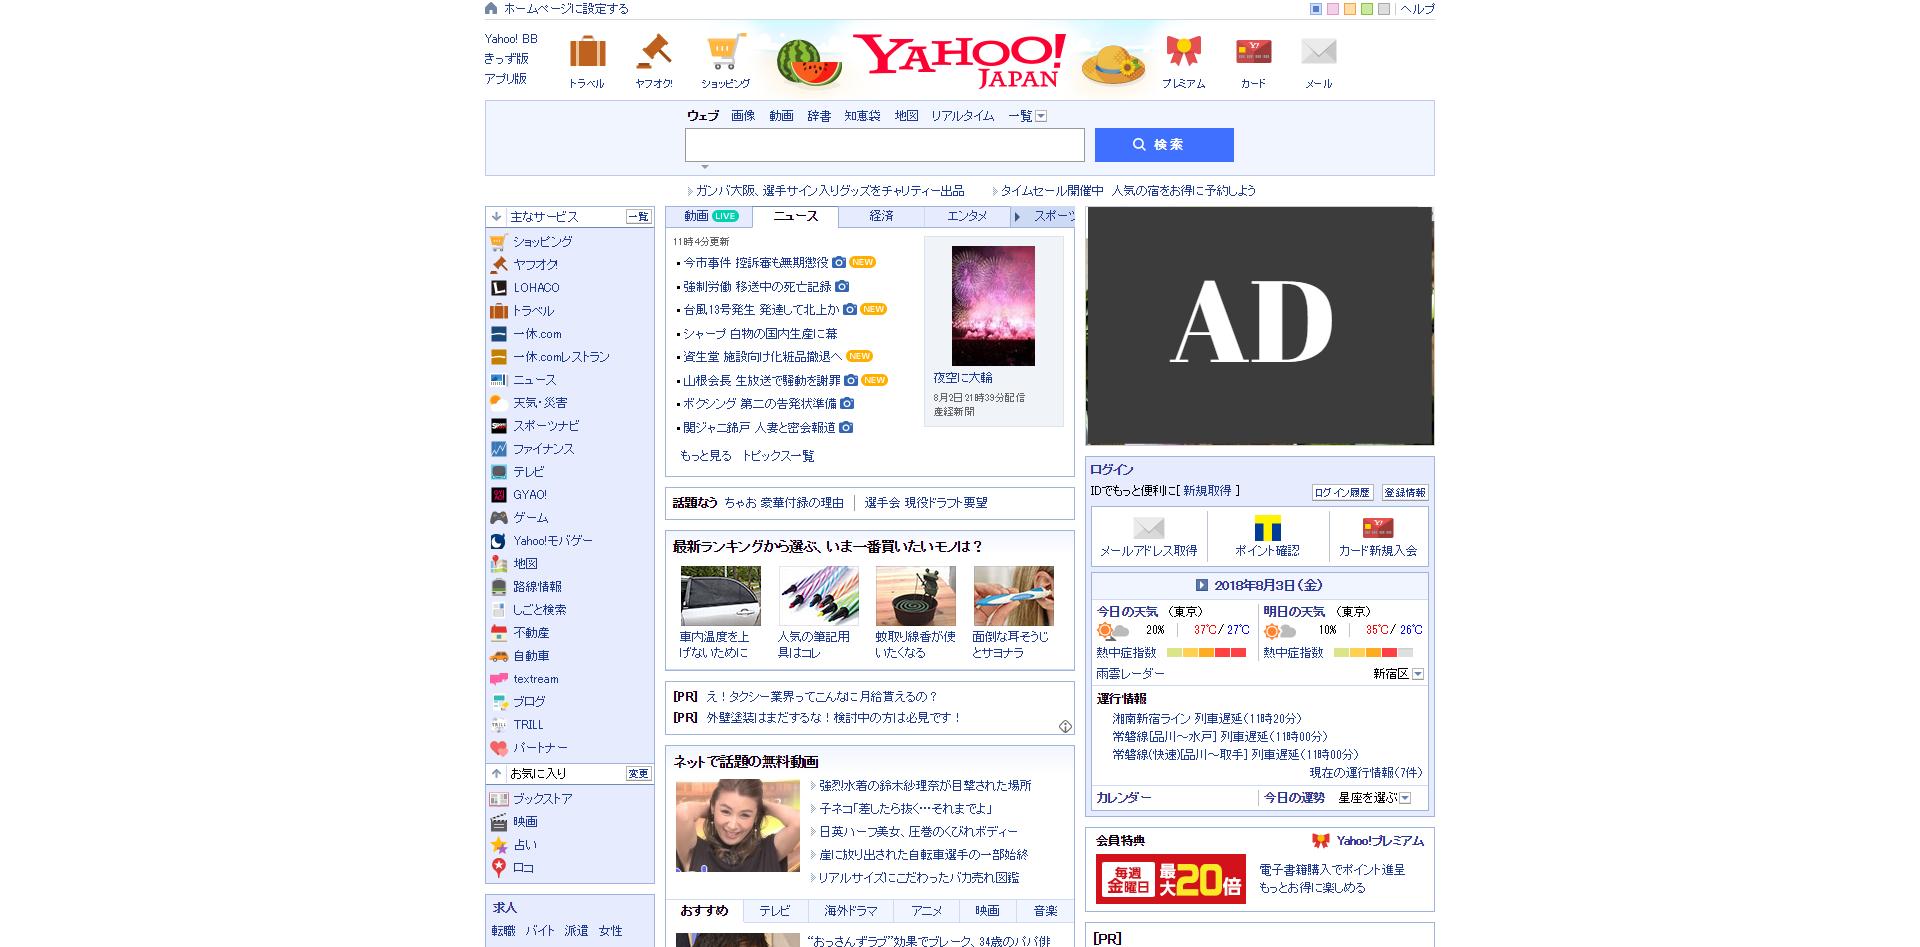 FireShot Capture 1 - Yahoo JAPAN - https___wwwyahoocojp_ (2)